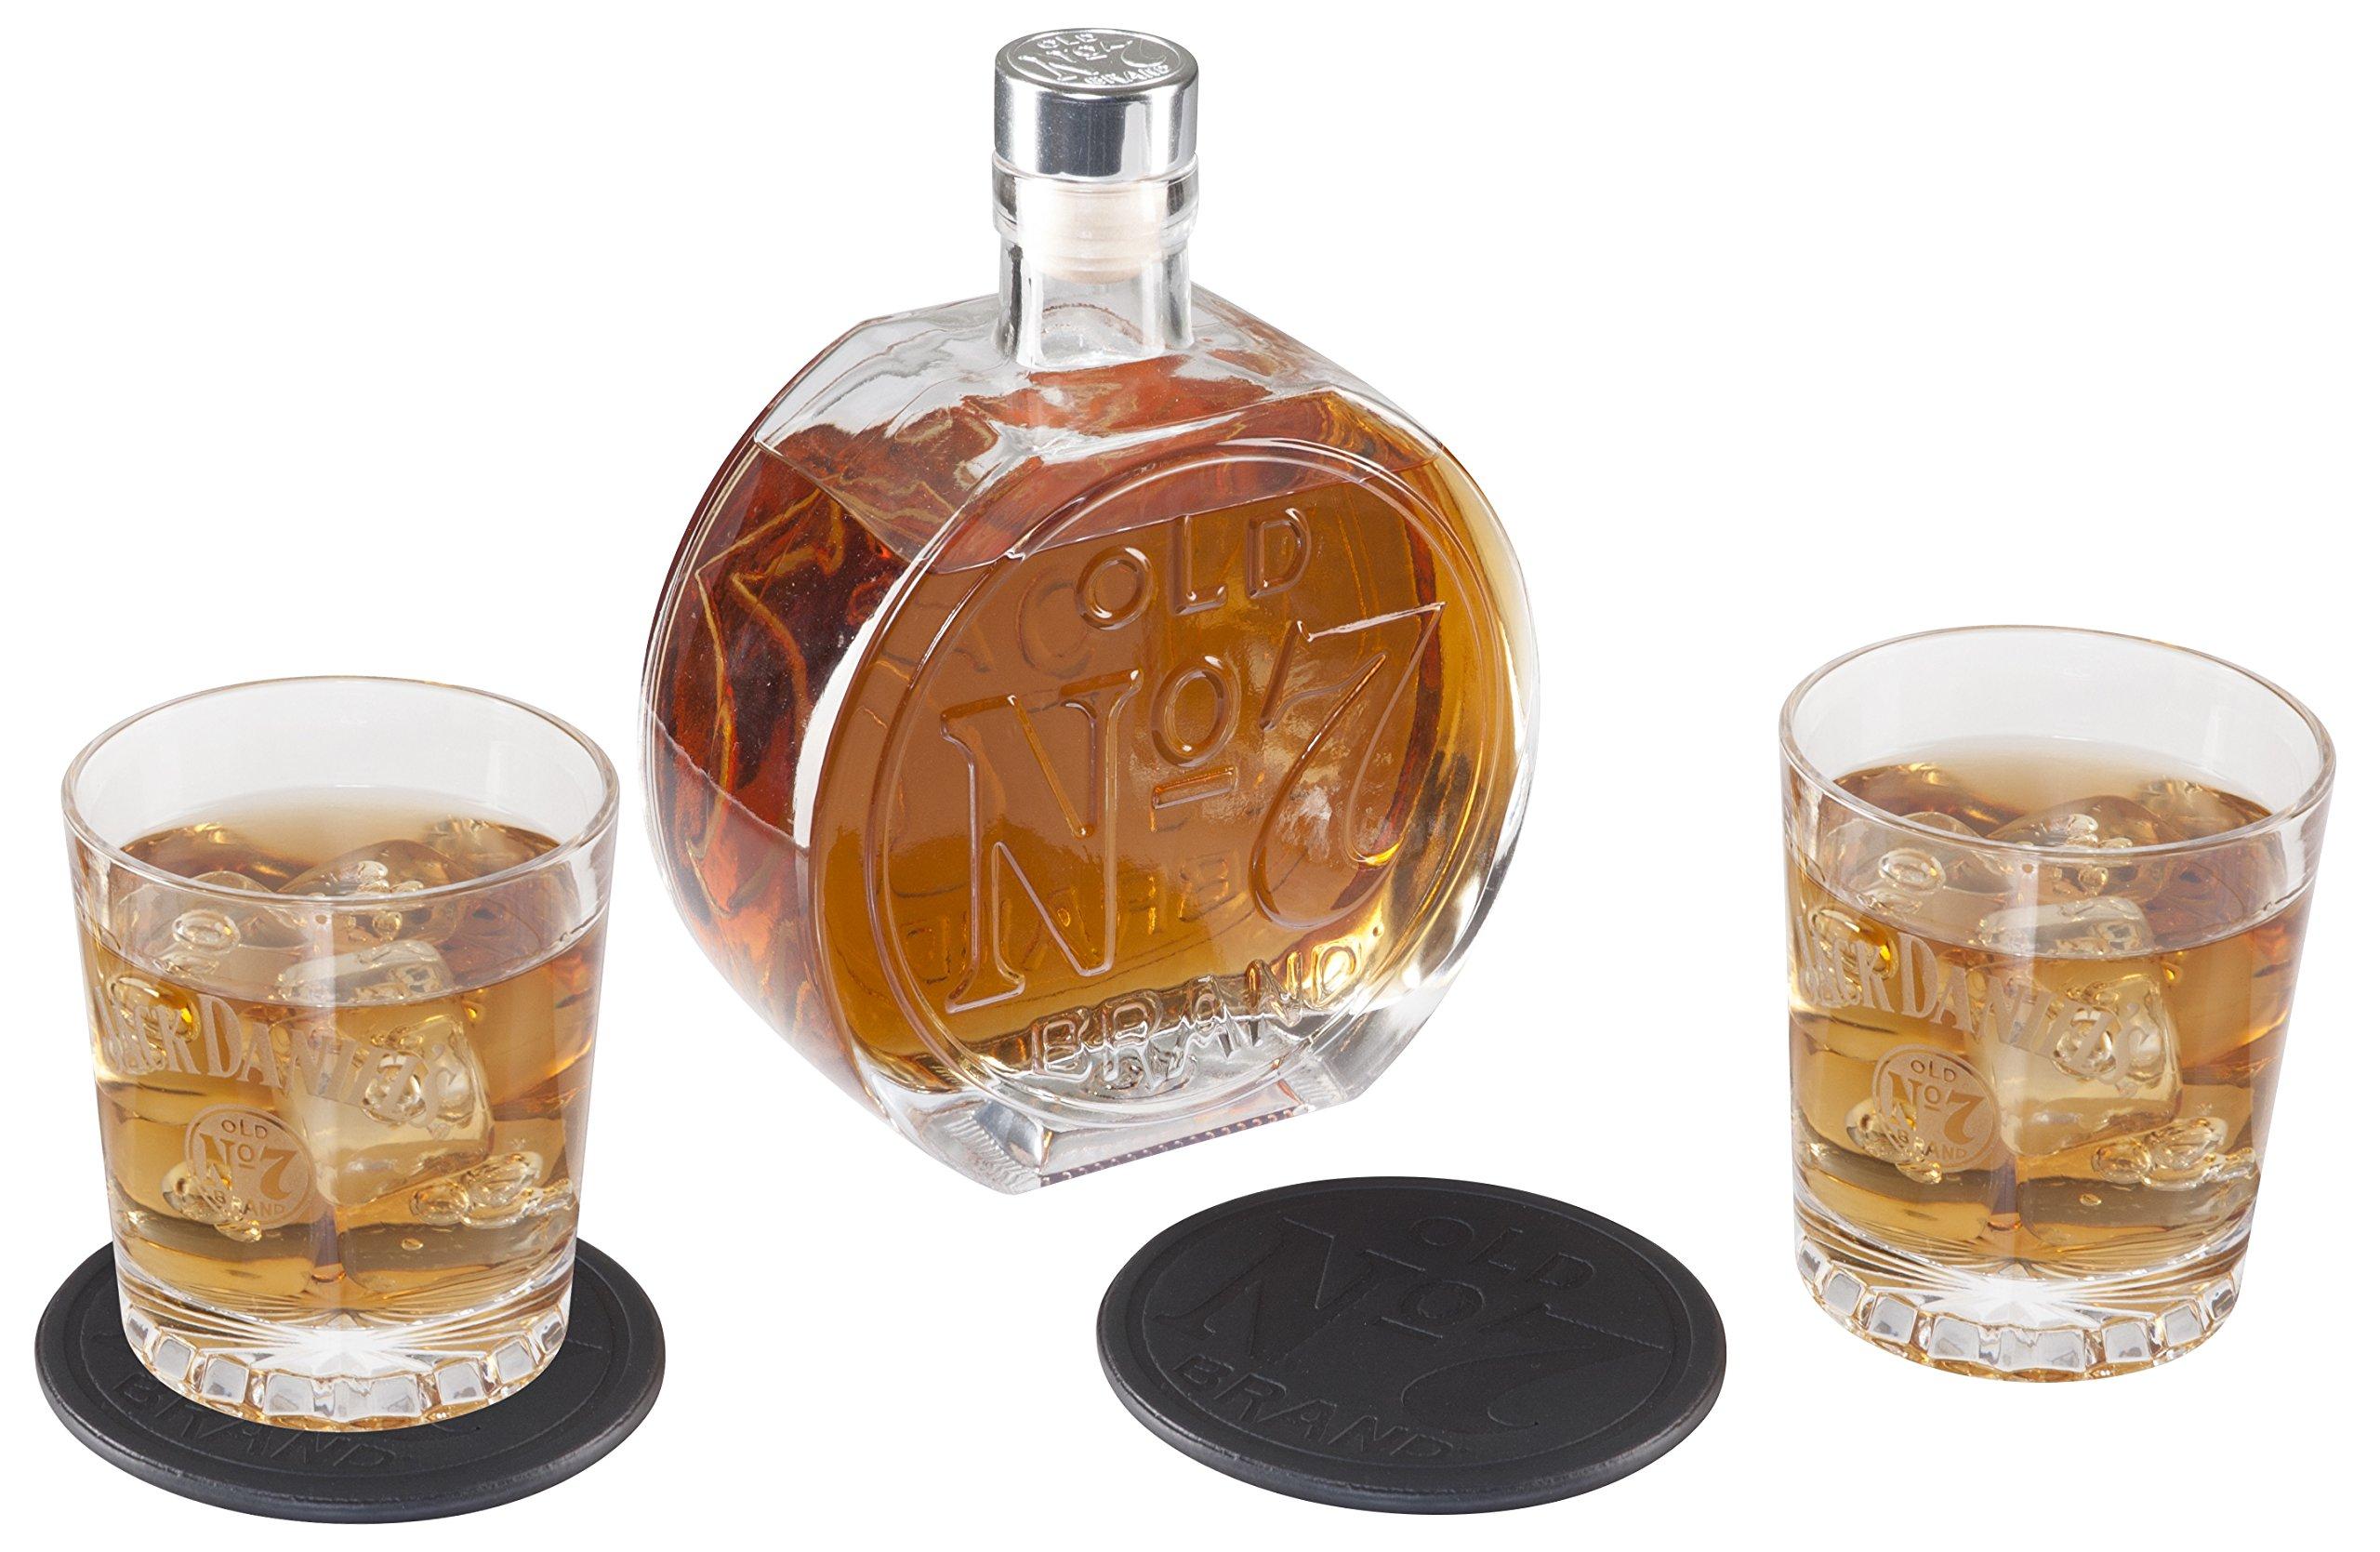 Jack Daniel's Old No.7 Decanter Set by Jack Daniel's